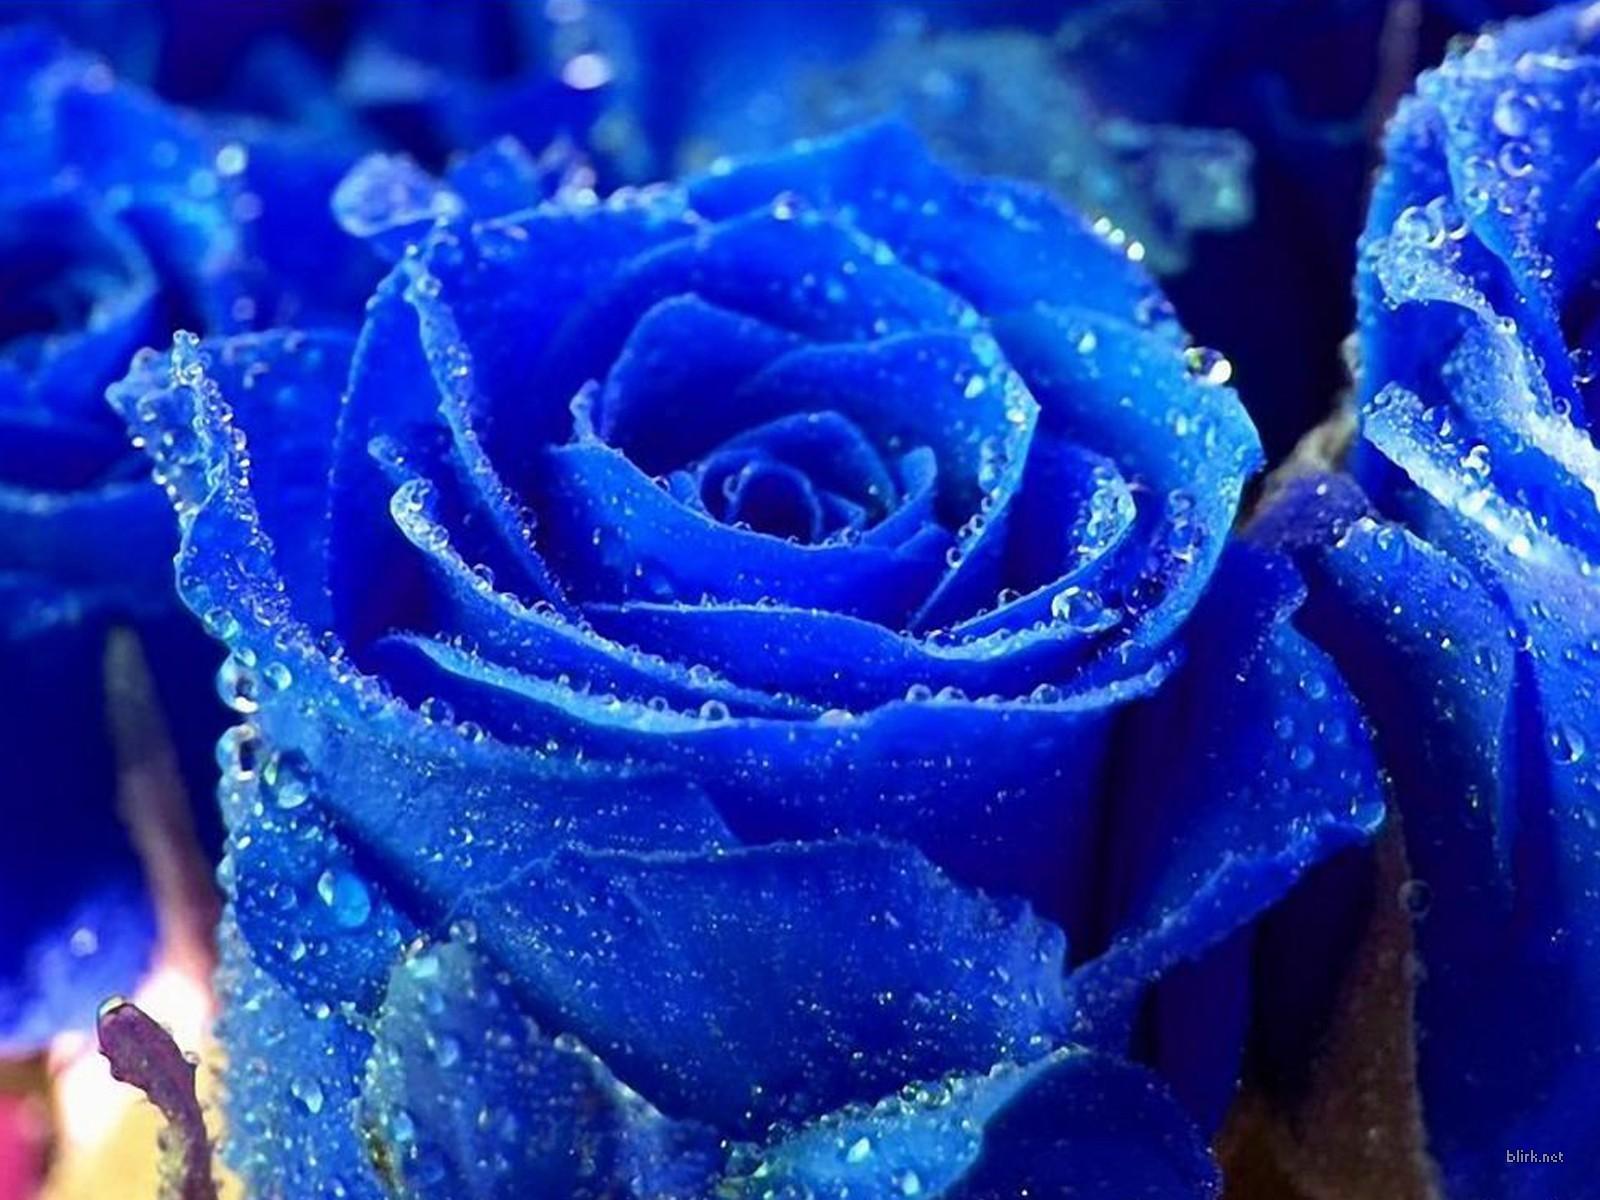 http://1.bp.blogspot.com/-vbzSiH56RIY/TcsMuy7QNwI/AAAAAAAABYQ/b1ZZxu4kmRM/s1600/Blue-Roses-Wallpaper_1205201102.jpg